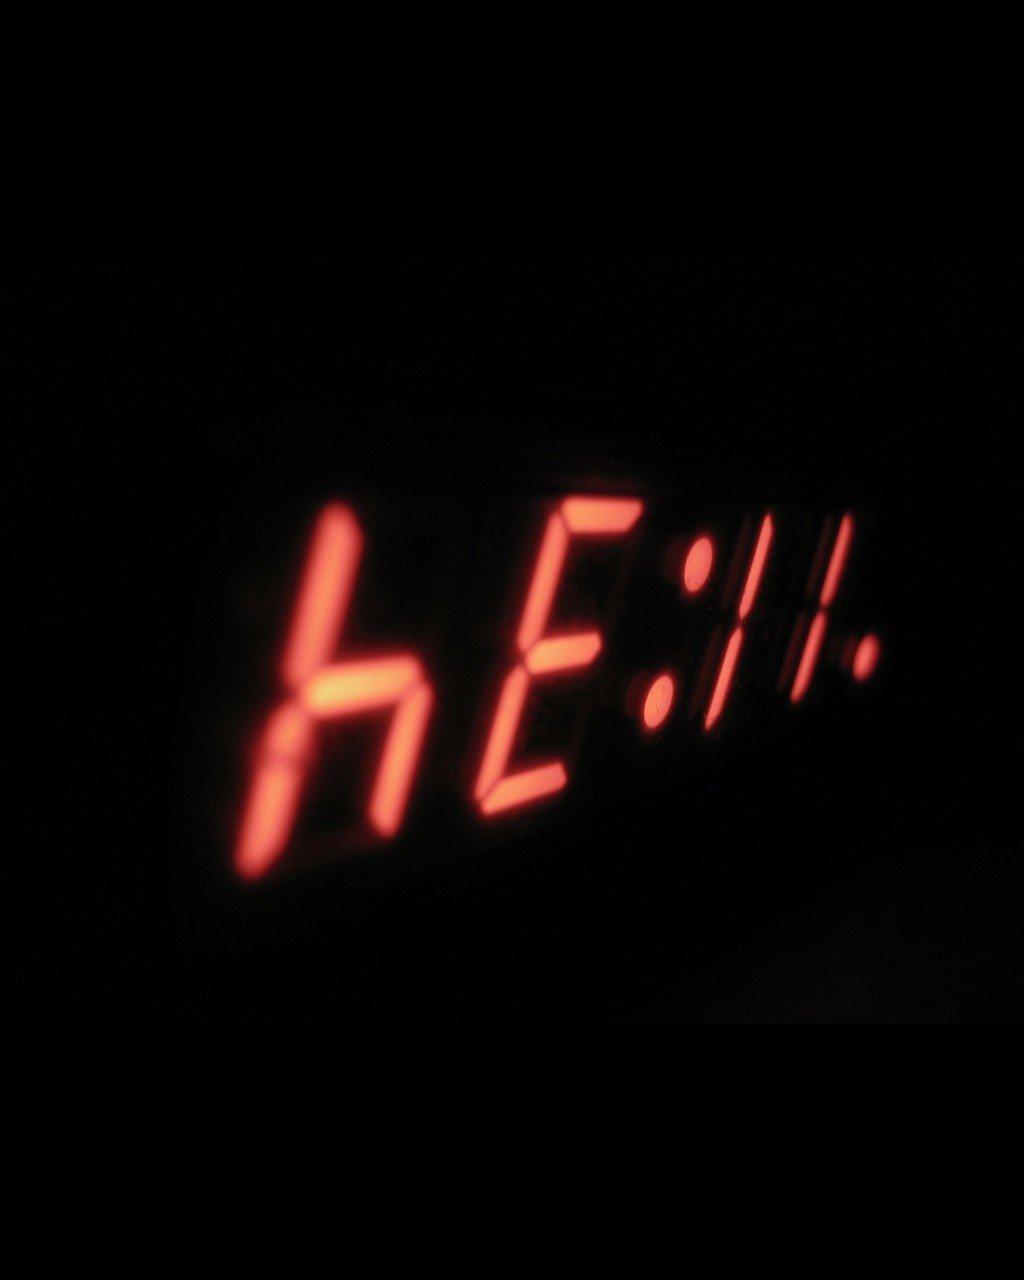 1024x1280 px 7 segment clocks hell night time upside down